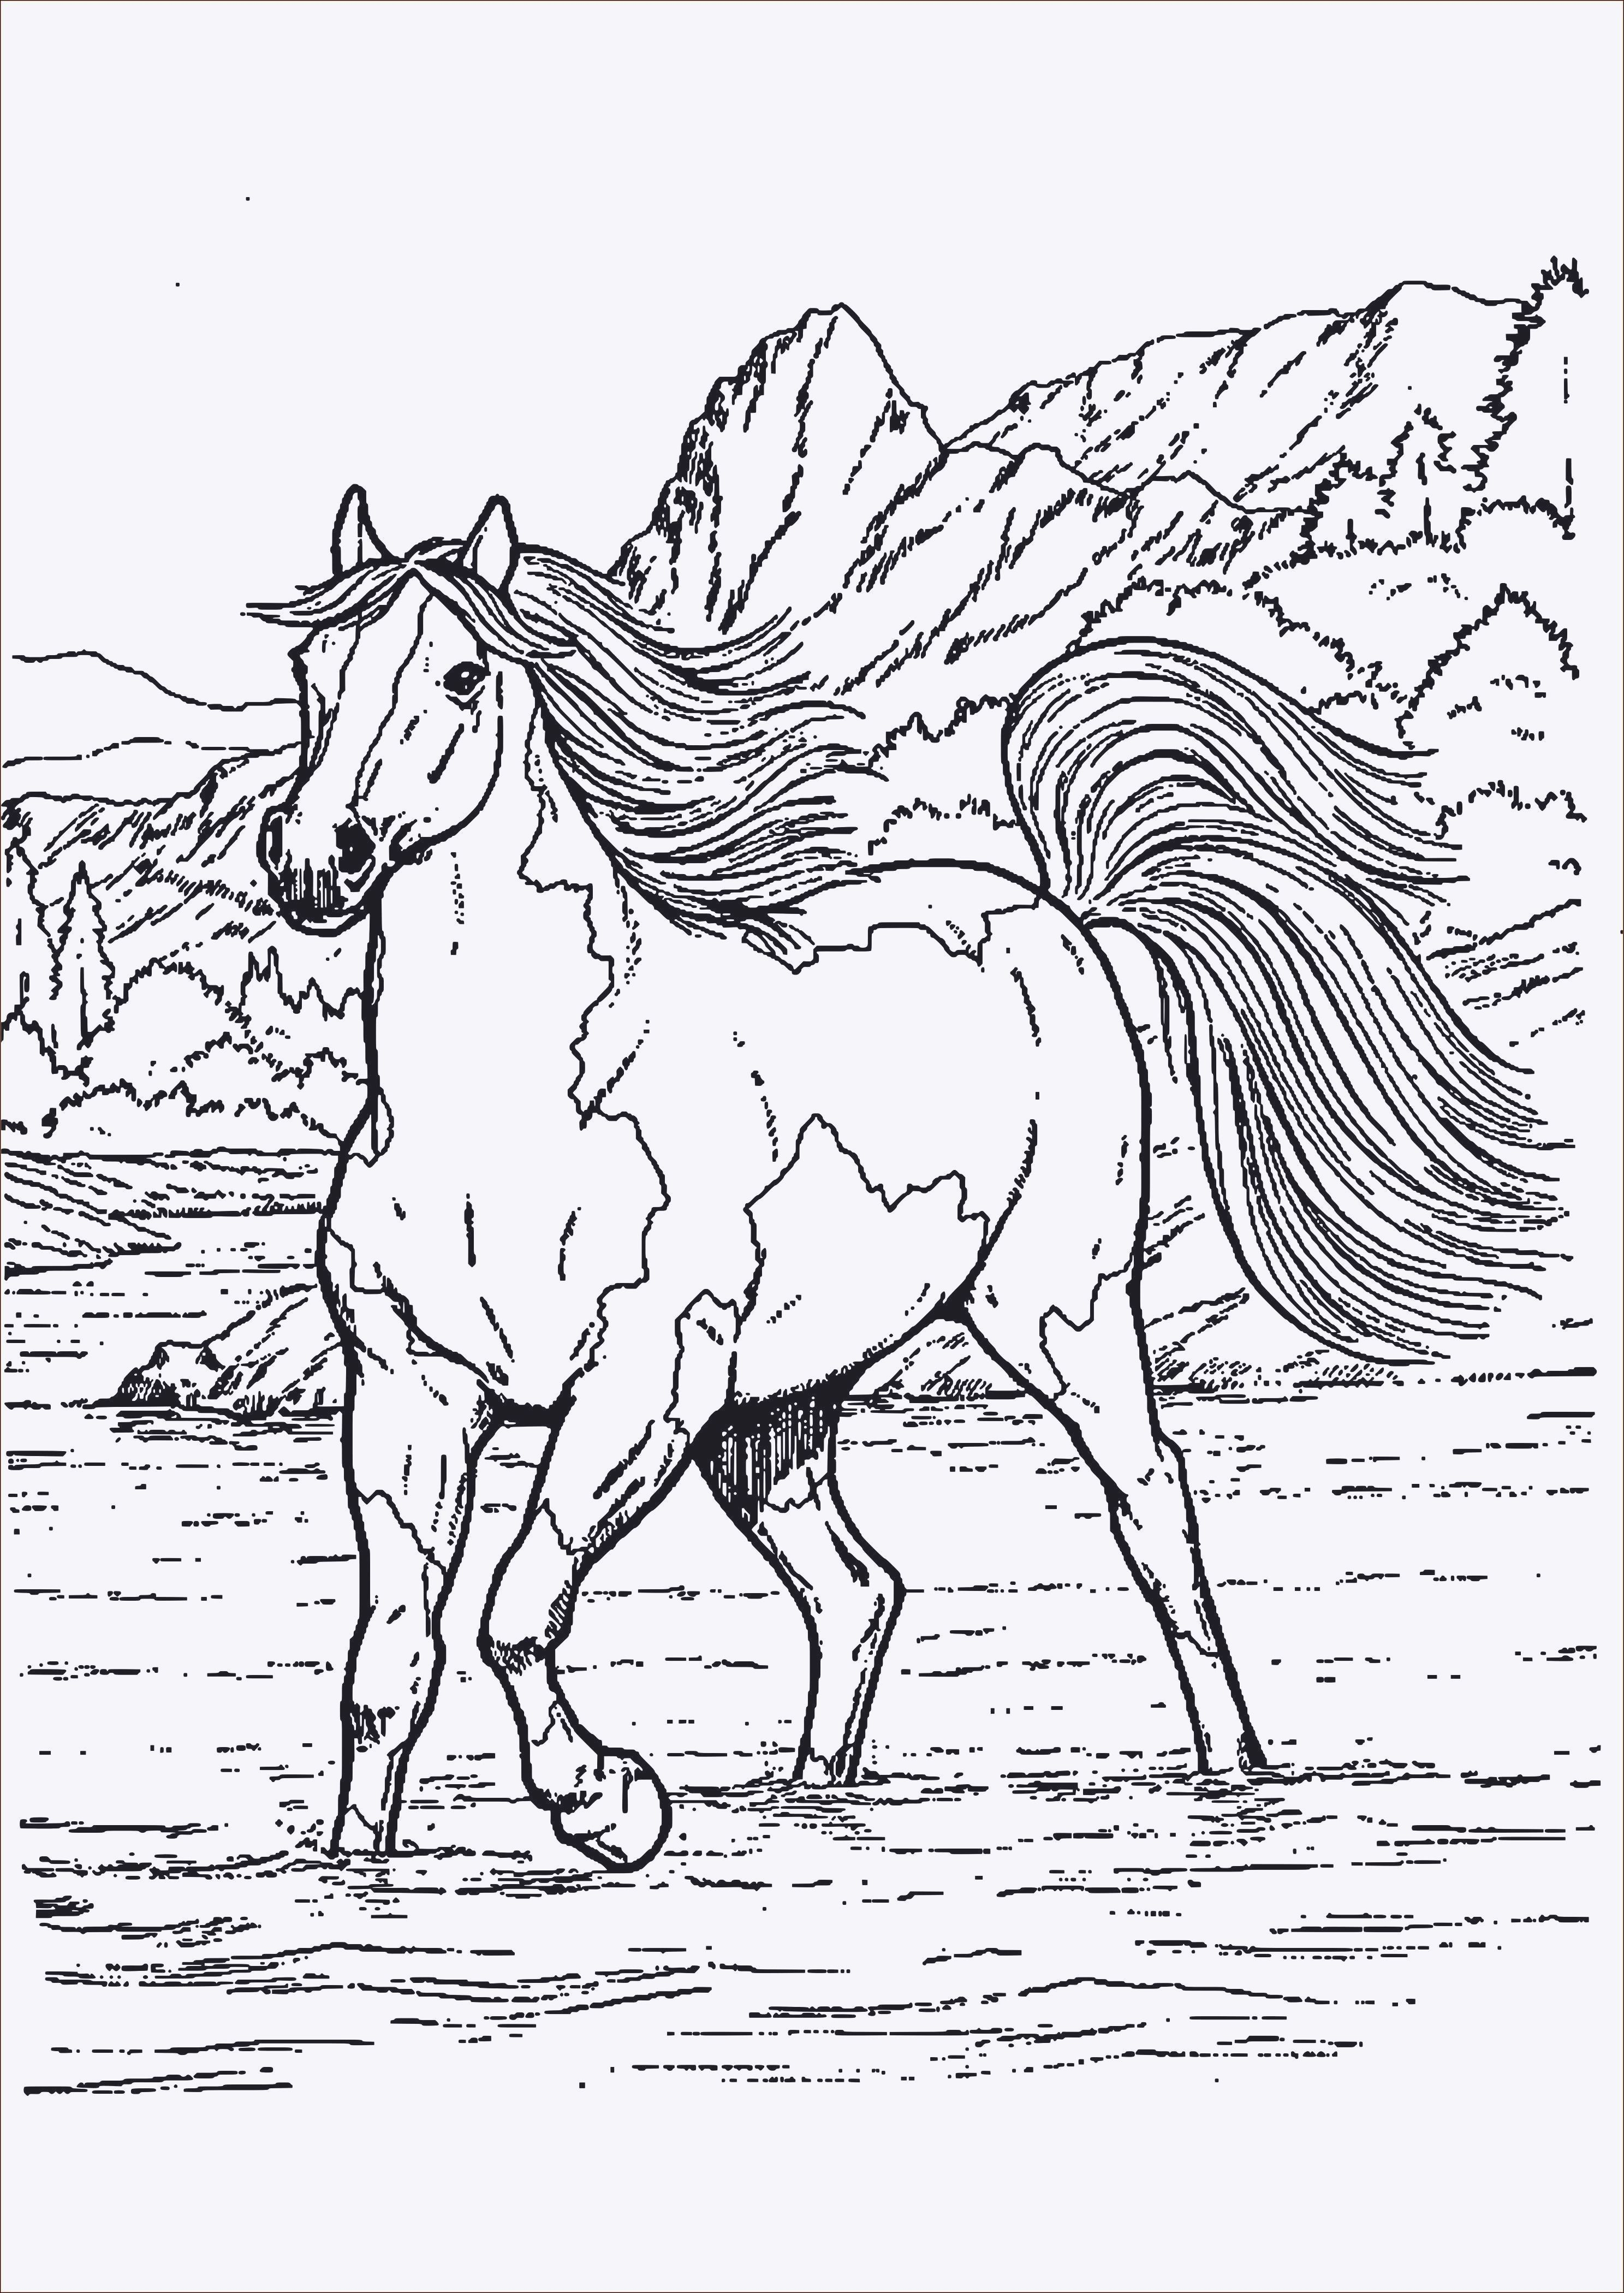 Unique Ausmalbild Pferd Mit Fohlen Farbung Malvorlagen Malvorlagenfurkinder Ausmalbilder Pferde Ausmalbilder Katzen Ausmalbilder Pferde Zum Ausdrucken